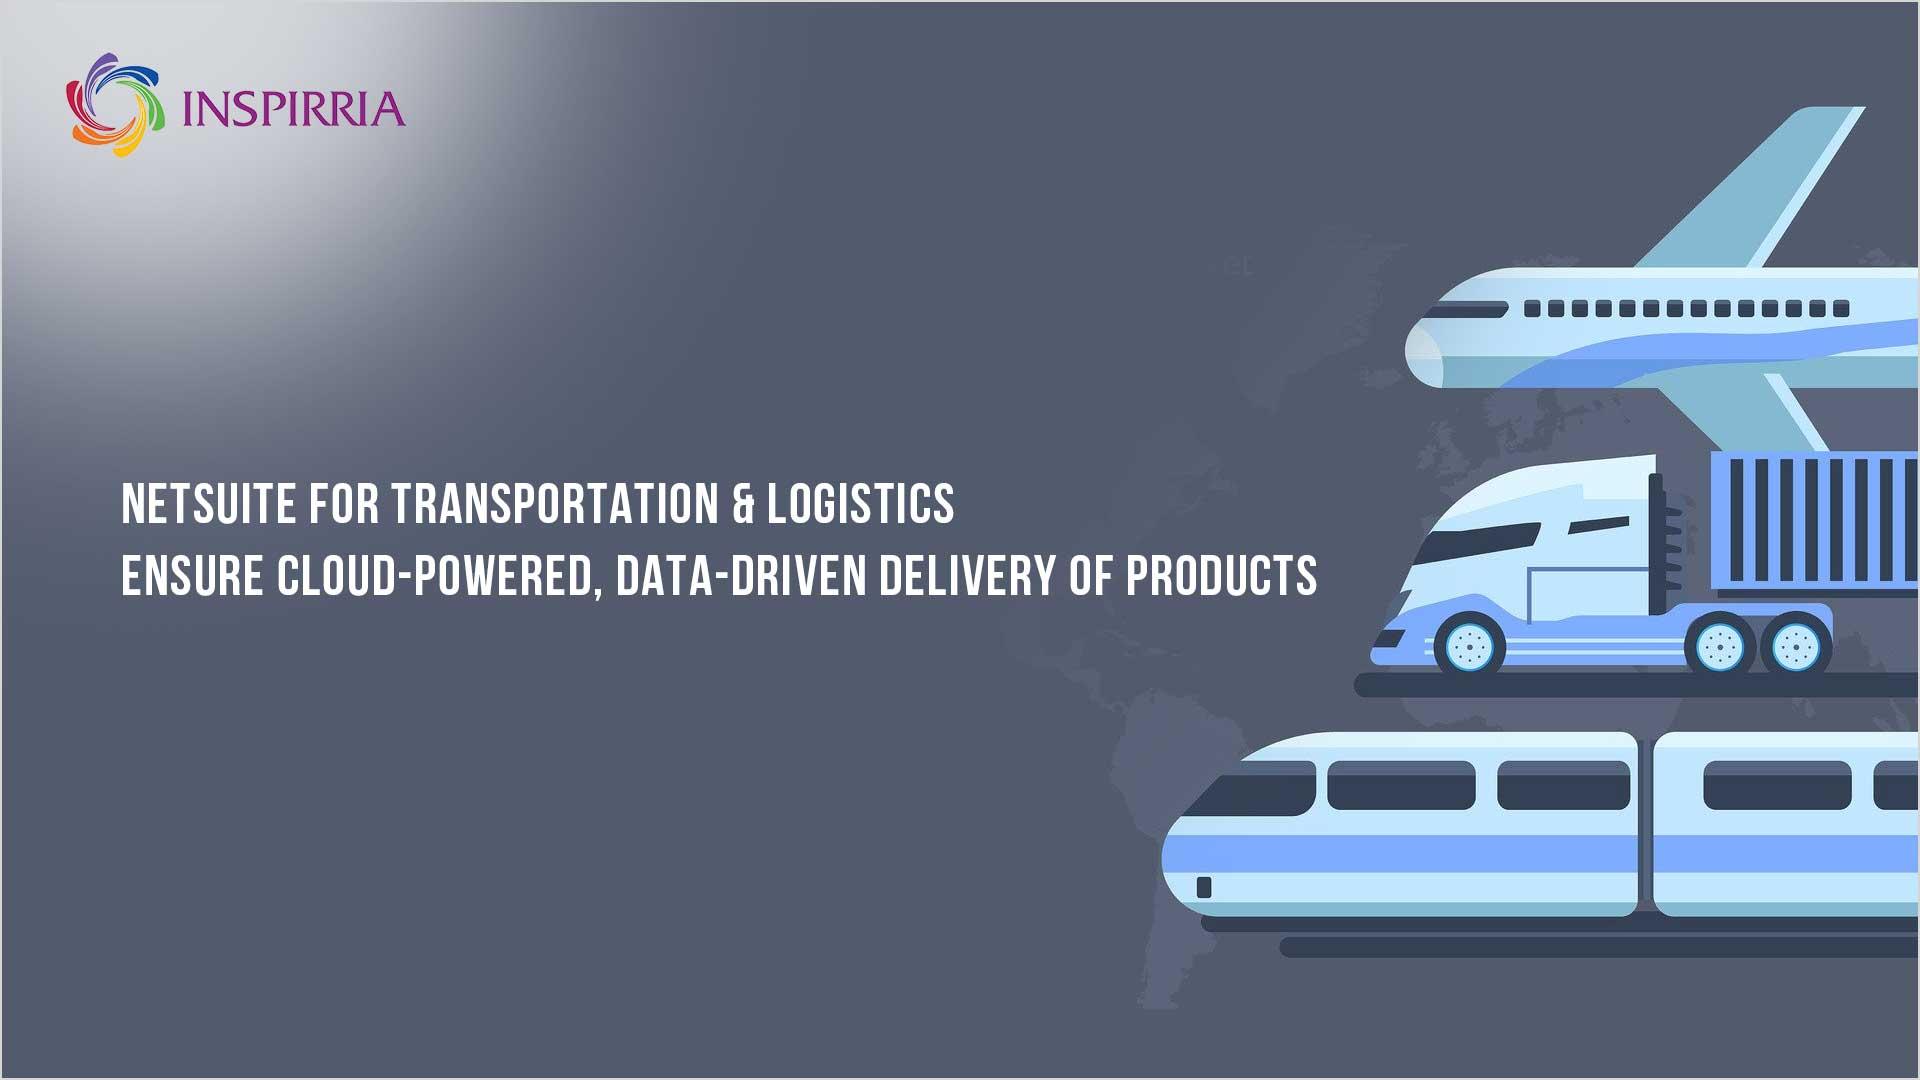 NetSuite for Transportation & Logistics